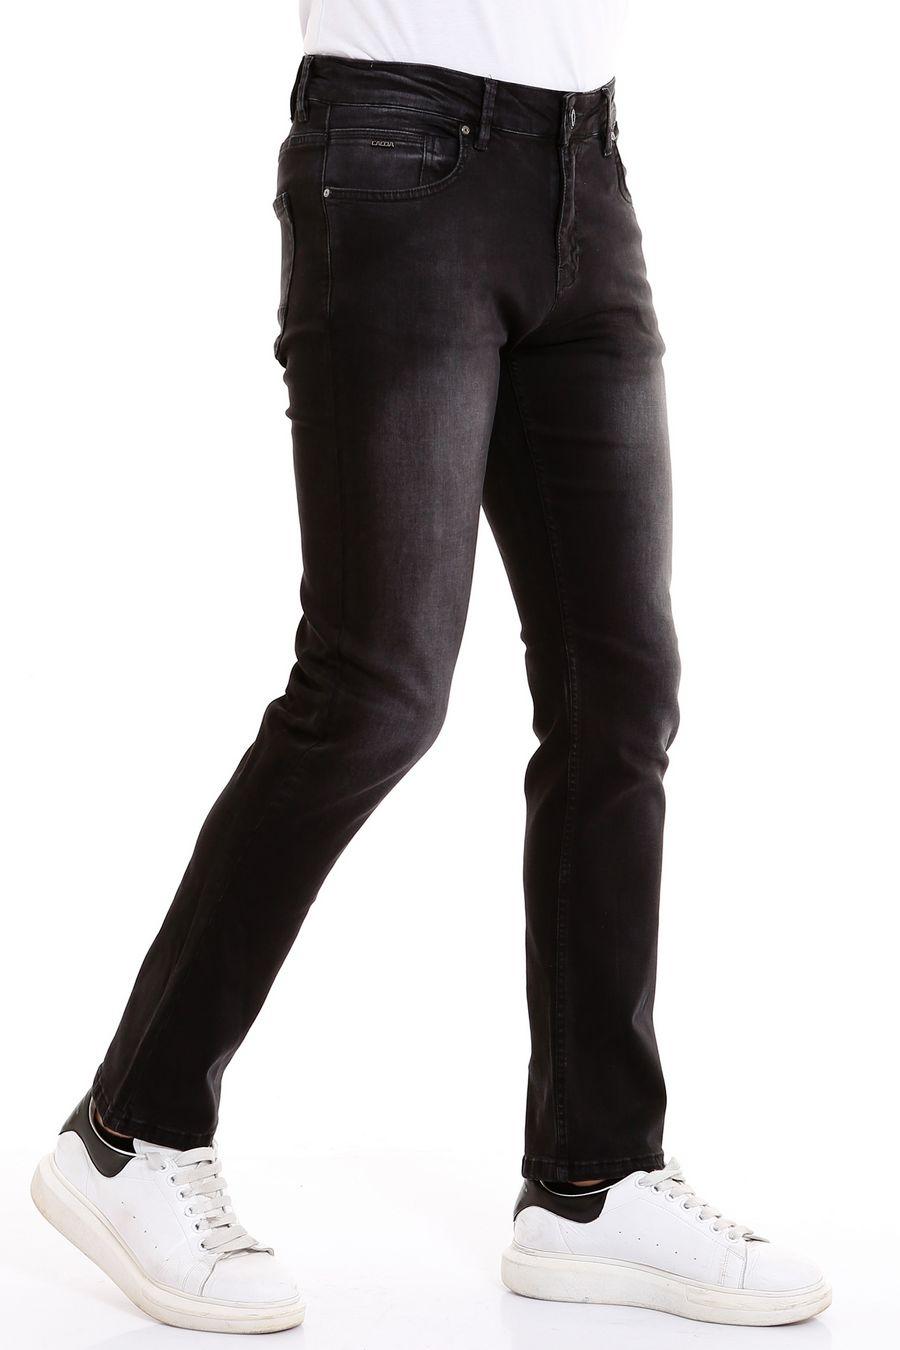 Джинсы мужские Caccia 2046 Black Black - фото 1